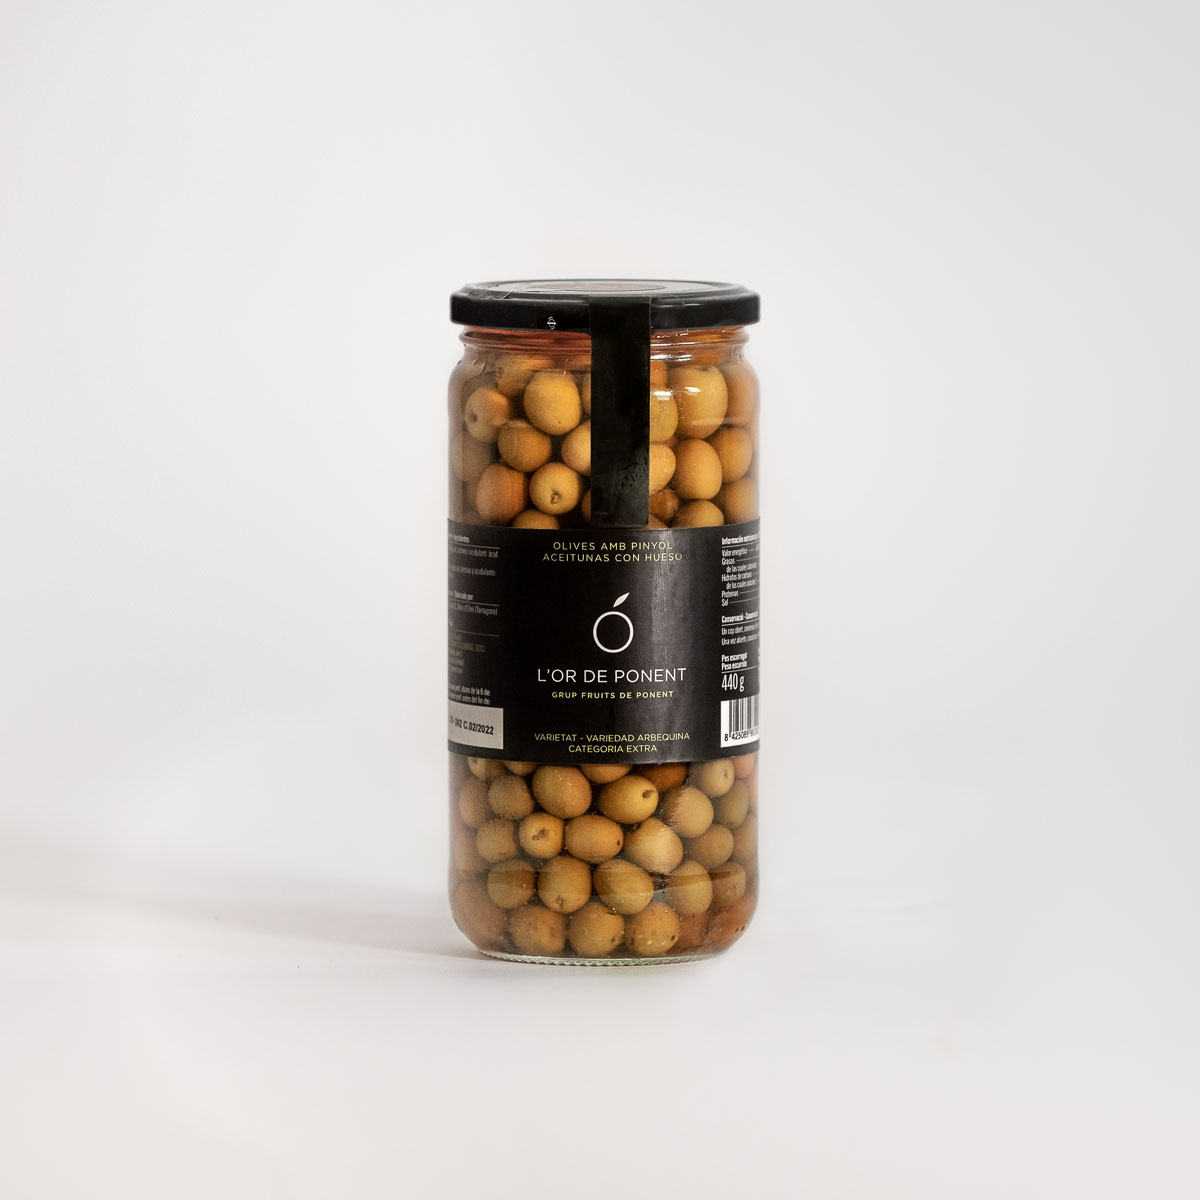 olivas-arbequinas-vidrio-Or-de-Ponent-aove-aceite-oliva-virgen-extra-garrigues-denominacion-origen-450-gr-1